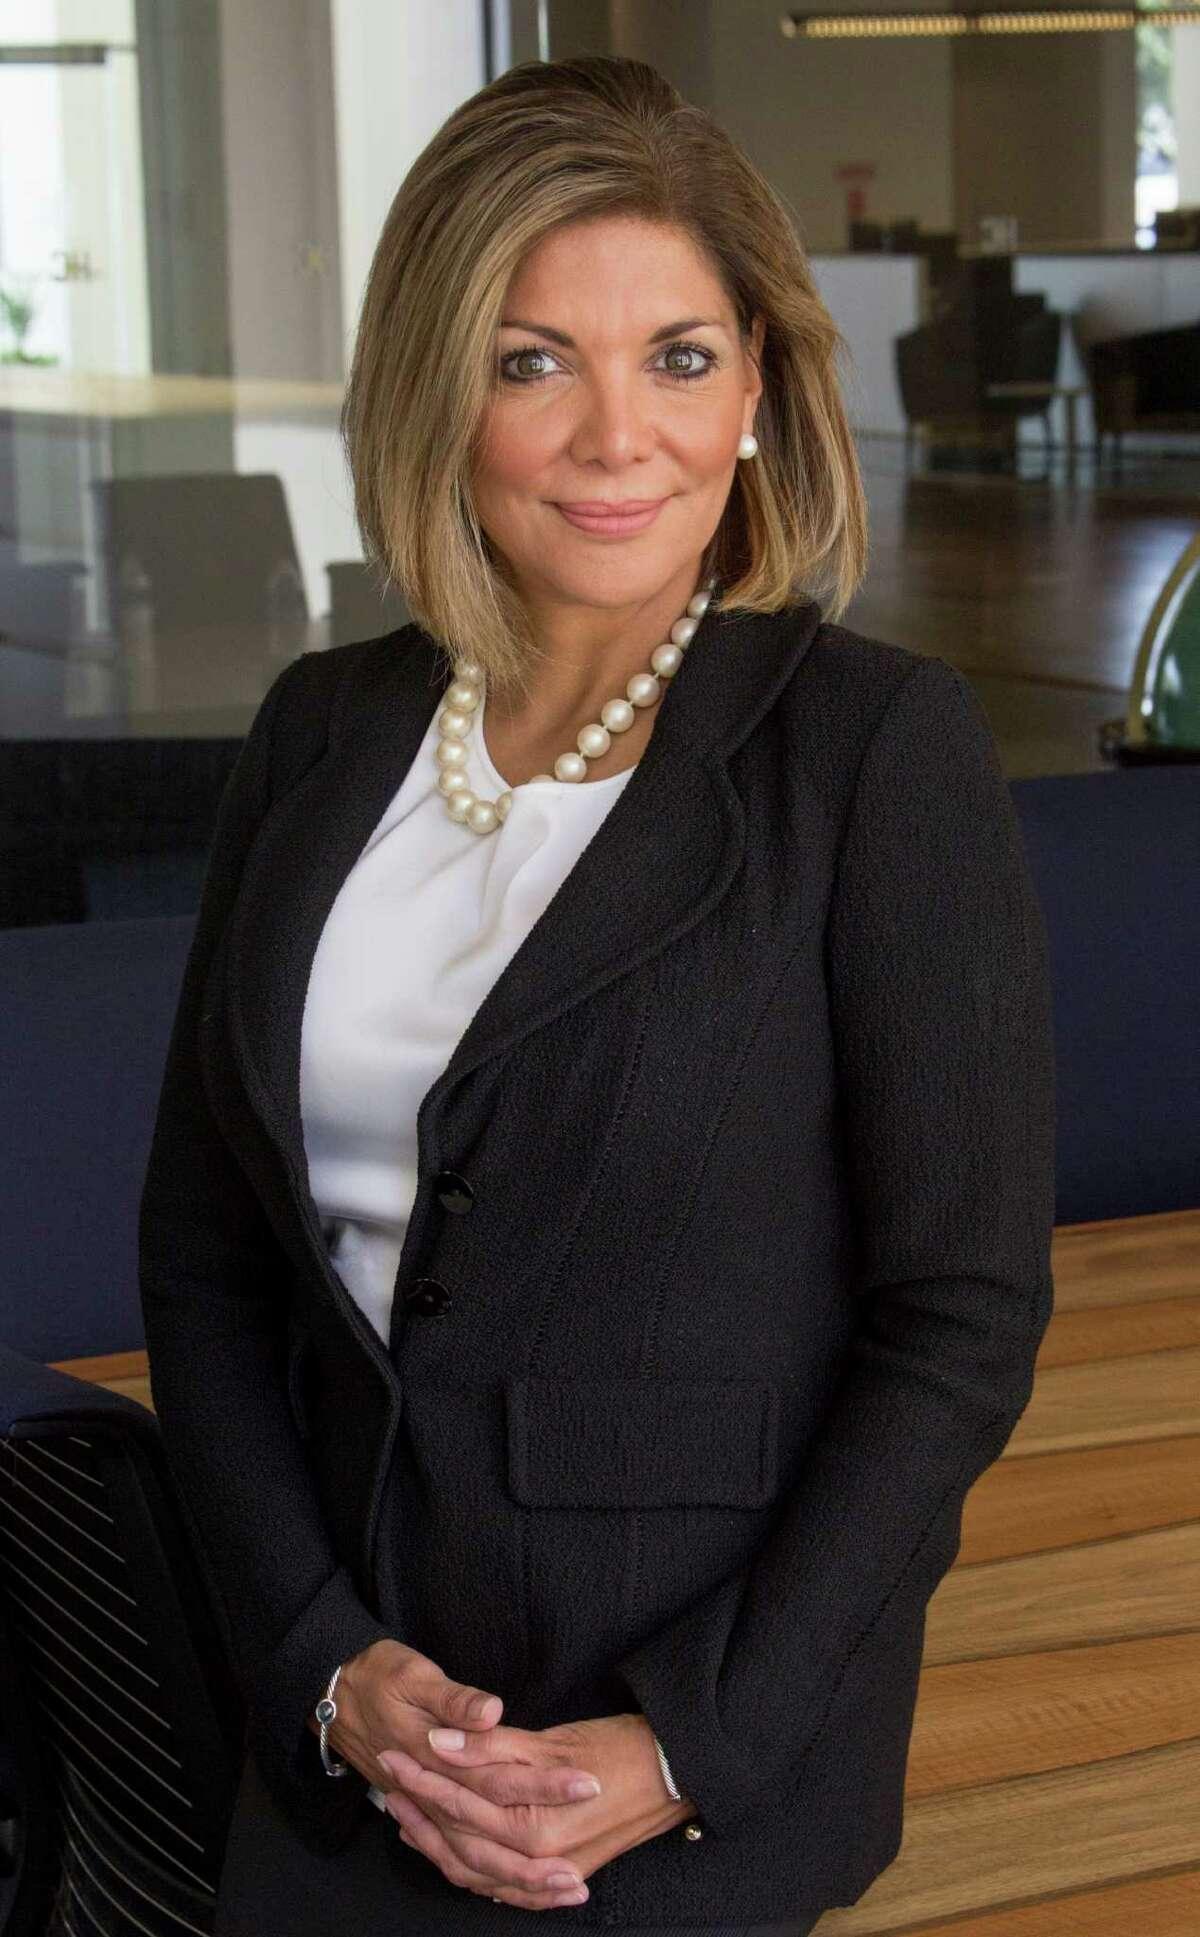 Eva Guzman is seeking re-election to the Texas Supreme Court, Place 9. (Photo: JeremyCarter/ Houston Chronicle)